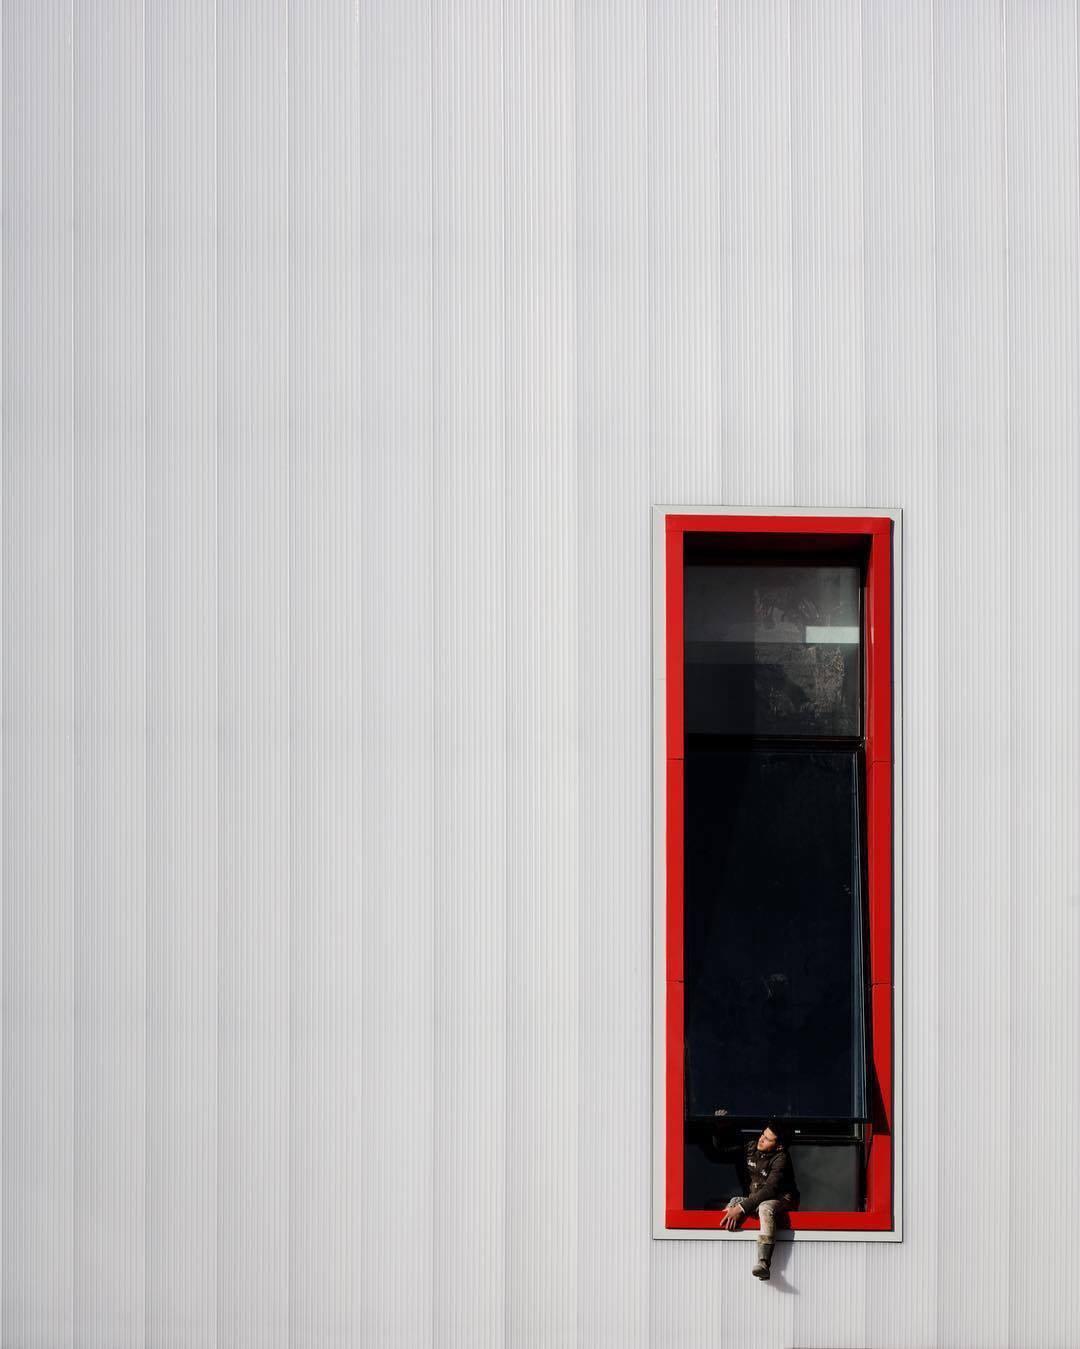 rgb_creative_ideas_design_photography_architecture_Serge_Najjar_010